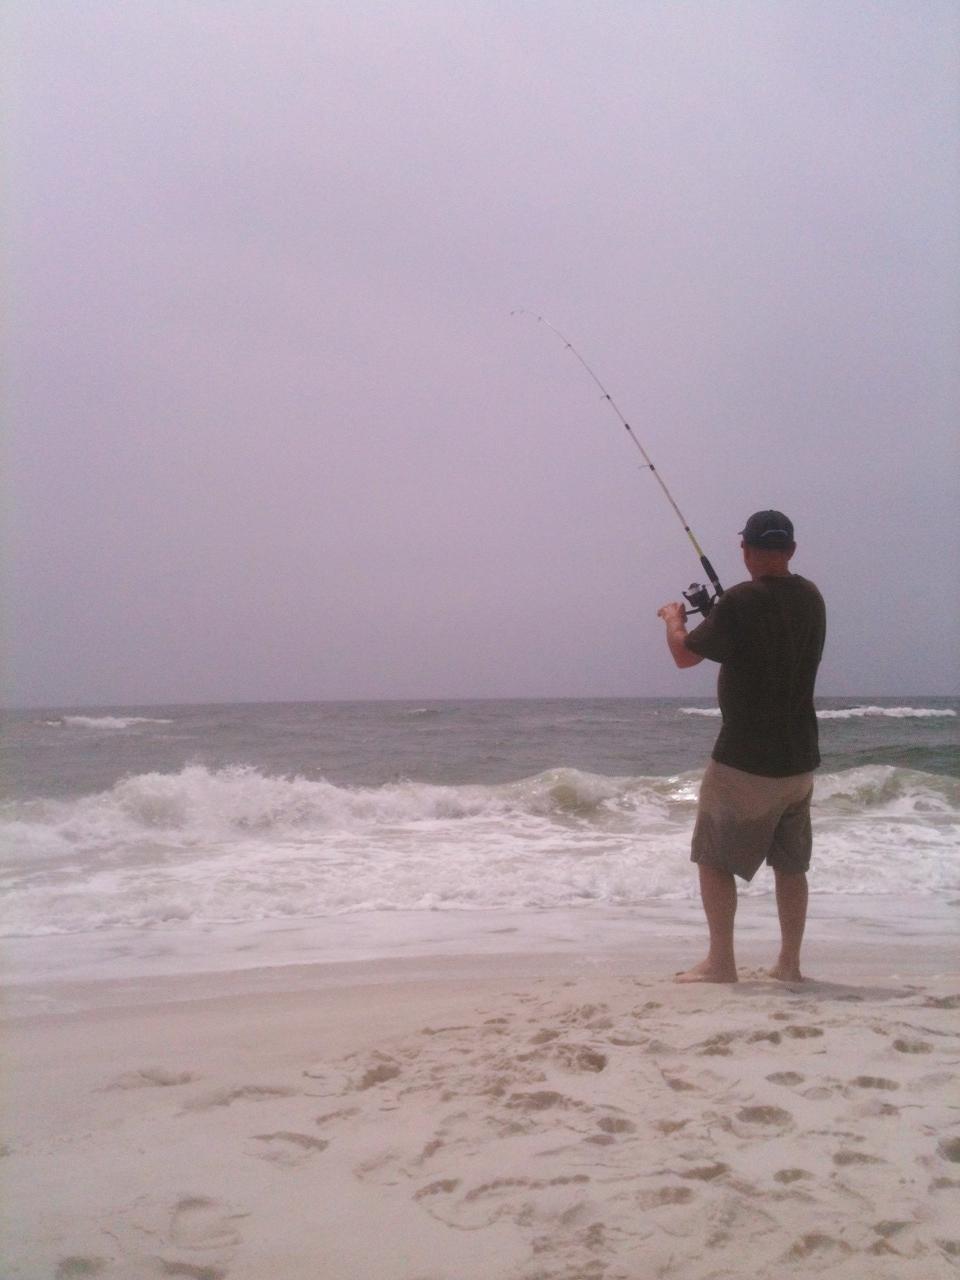 Fishing Holes The Martin S American Adventure